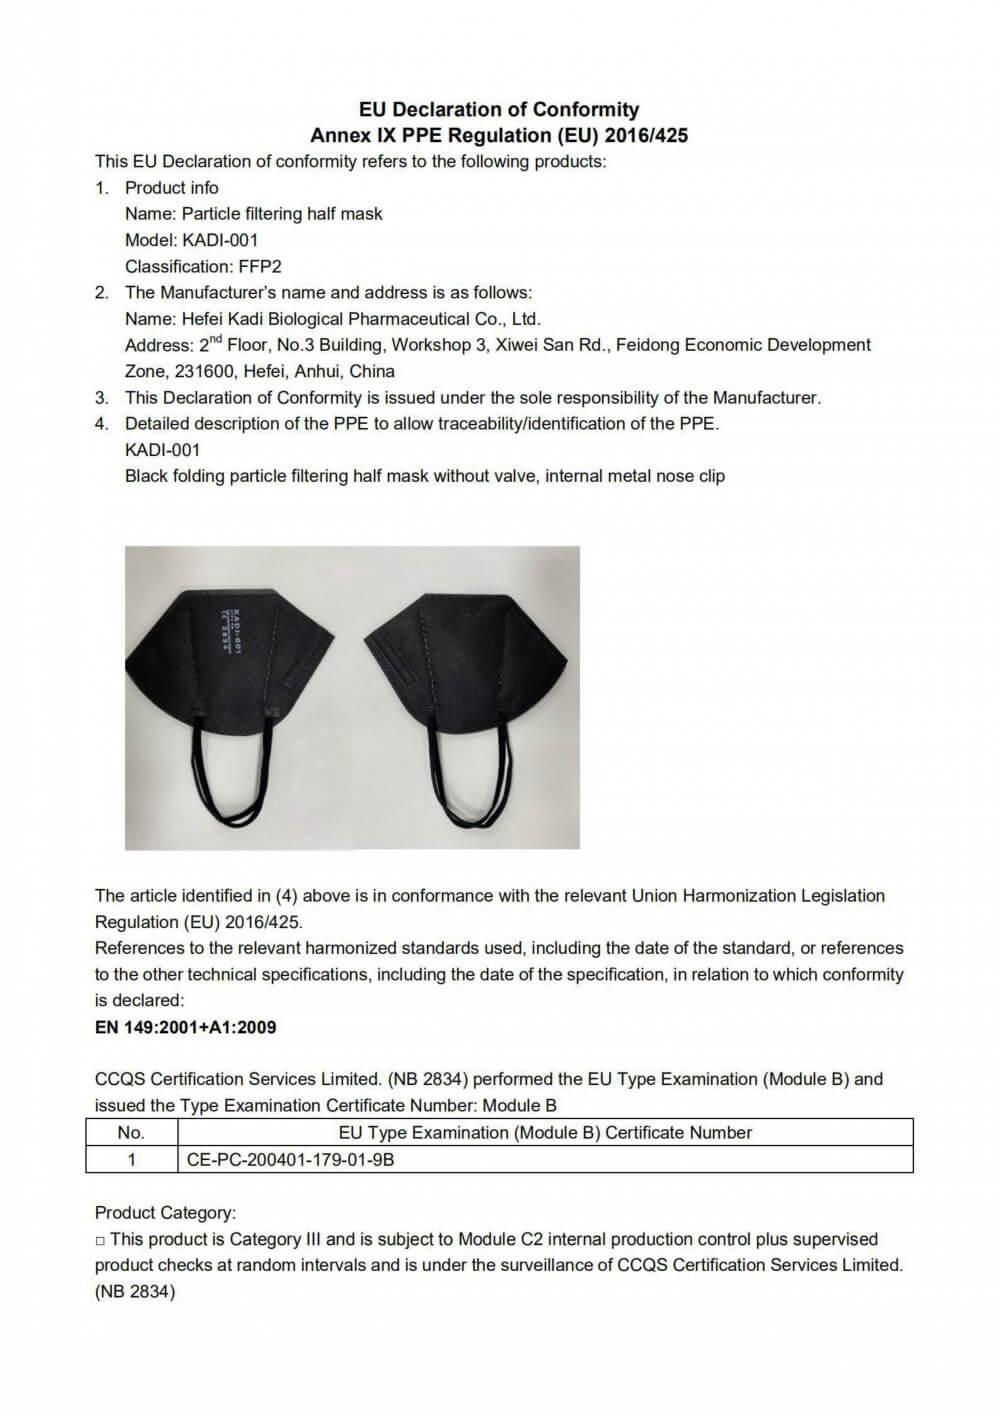 mascarilla negra ffp2